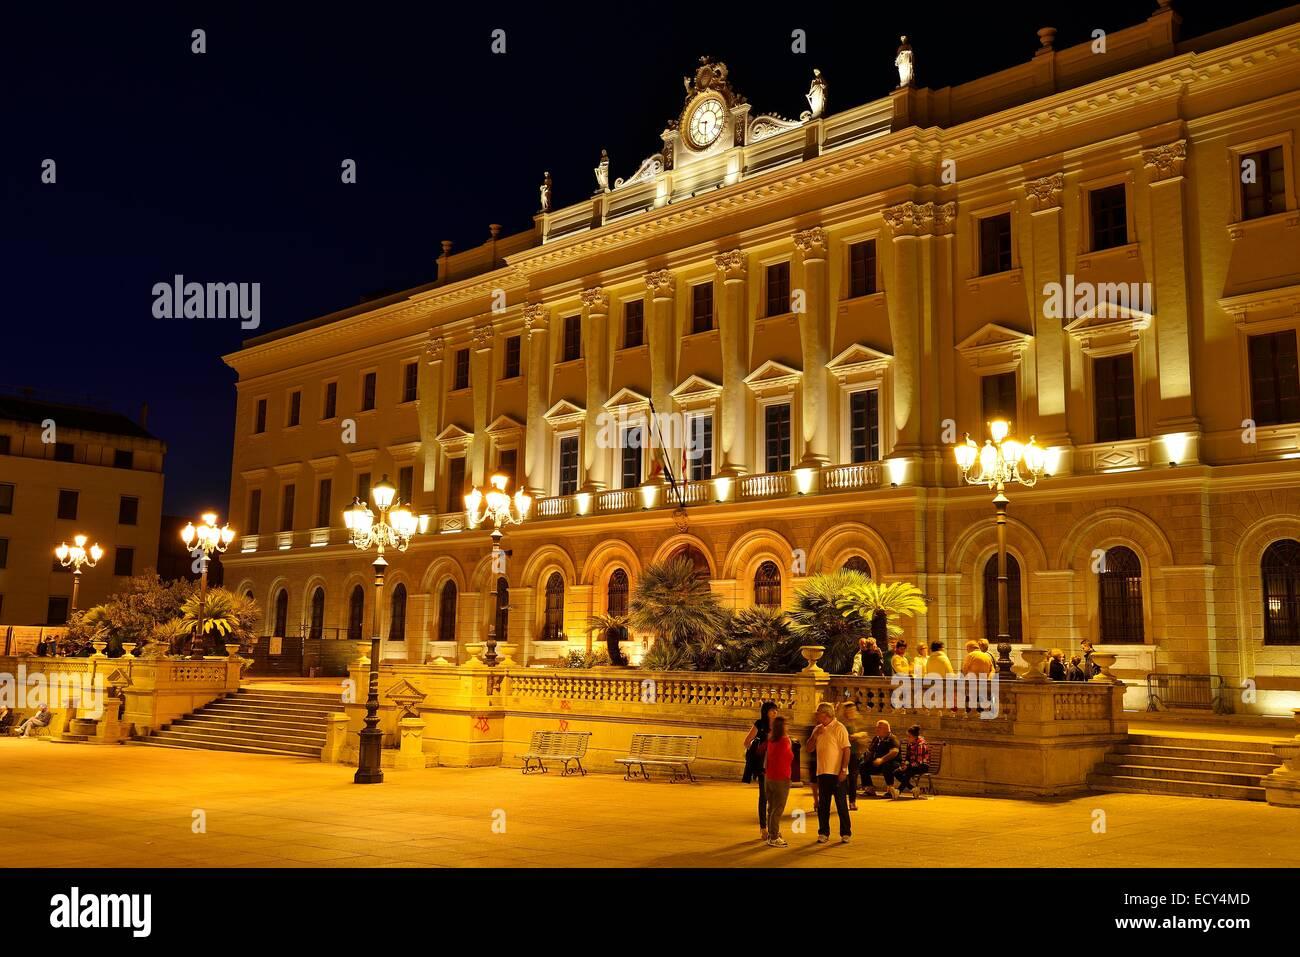 El Palazzo della Provincia en Piazza d'Italia en la noche, Sassari, provincia de Sassari, Cerdeña, Italia Imagen De Stock